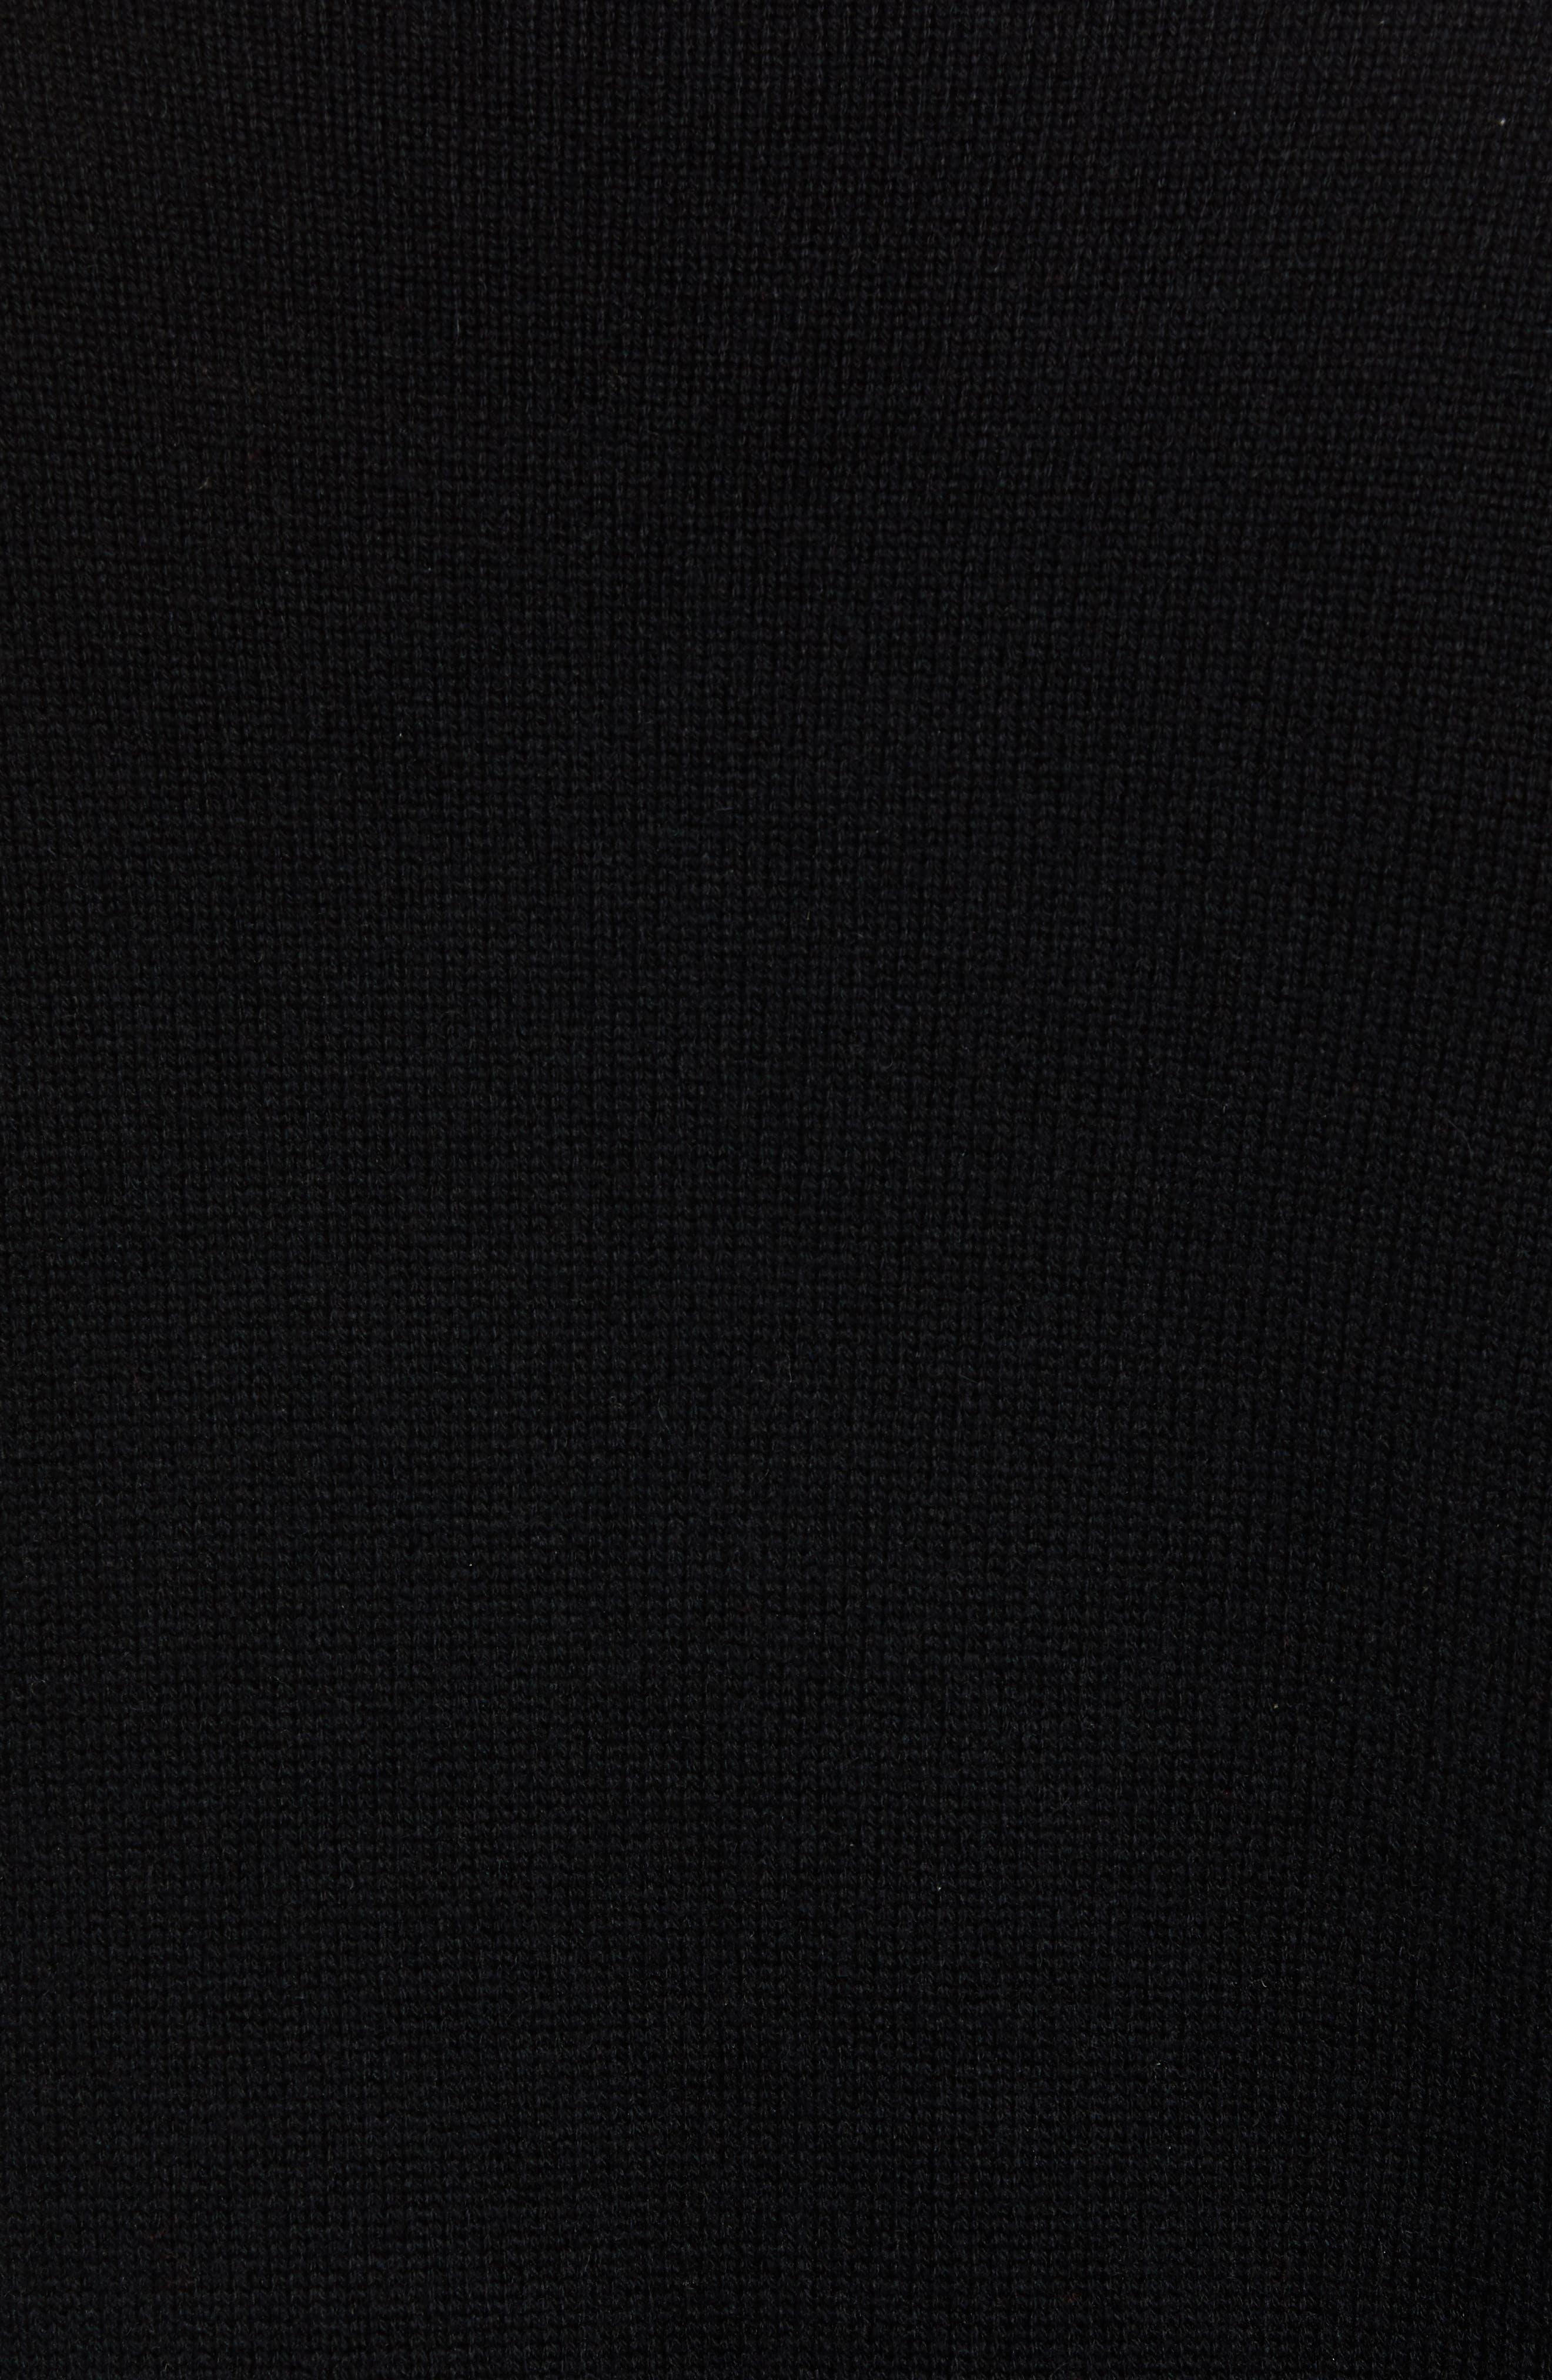 Wool & Cashmere Turtleneck Sweater,                             Alternate thumbnail 5, color,                             BLACK